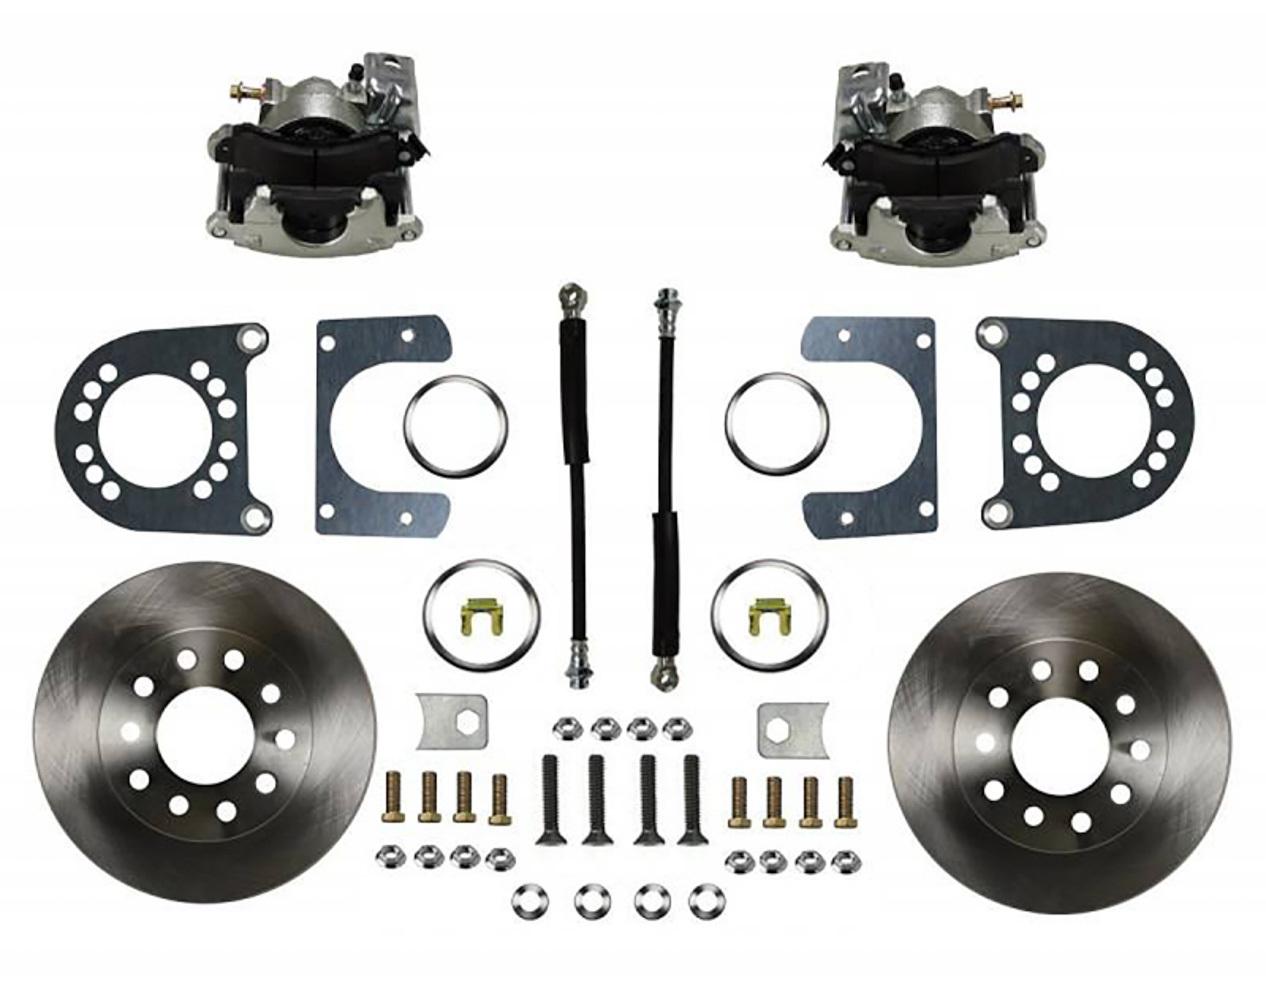 Leed Brakes GM 55-68 Rear Disc Brak e Kit Zinc Calipers